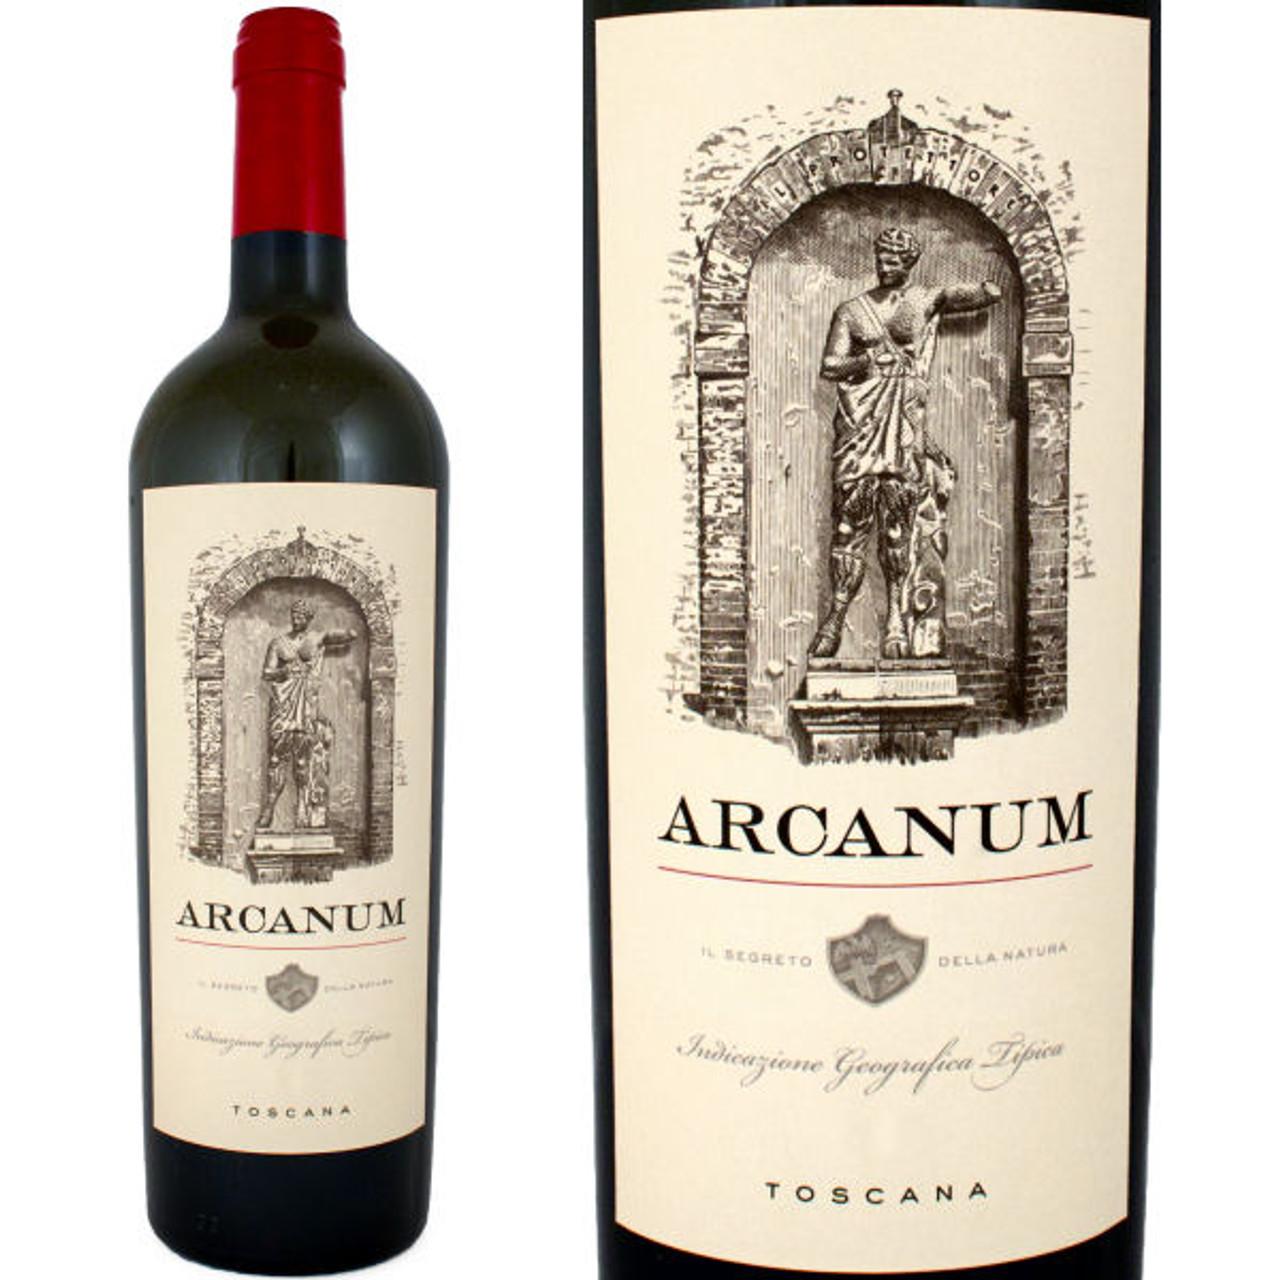 Tenuta Arceno Arcanum Toscana IGT